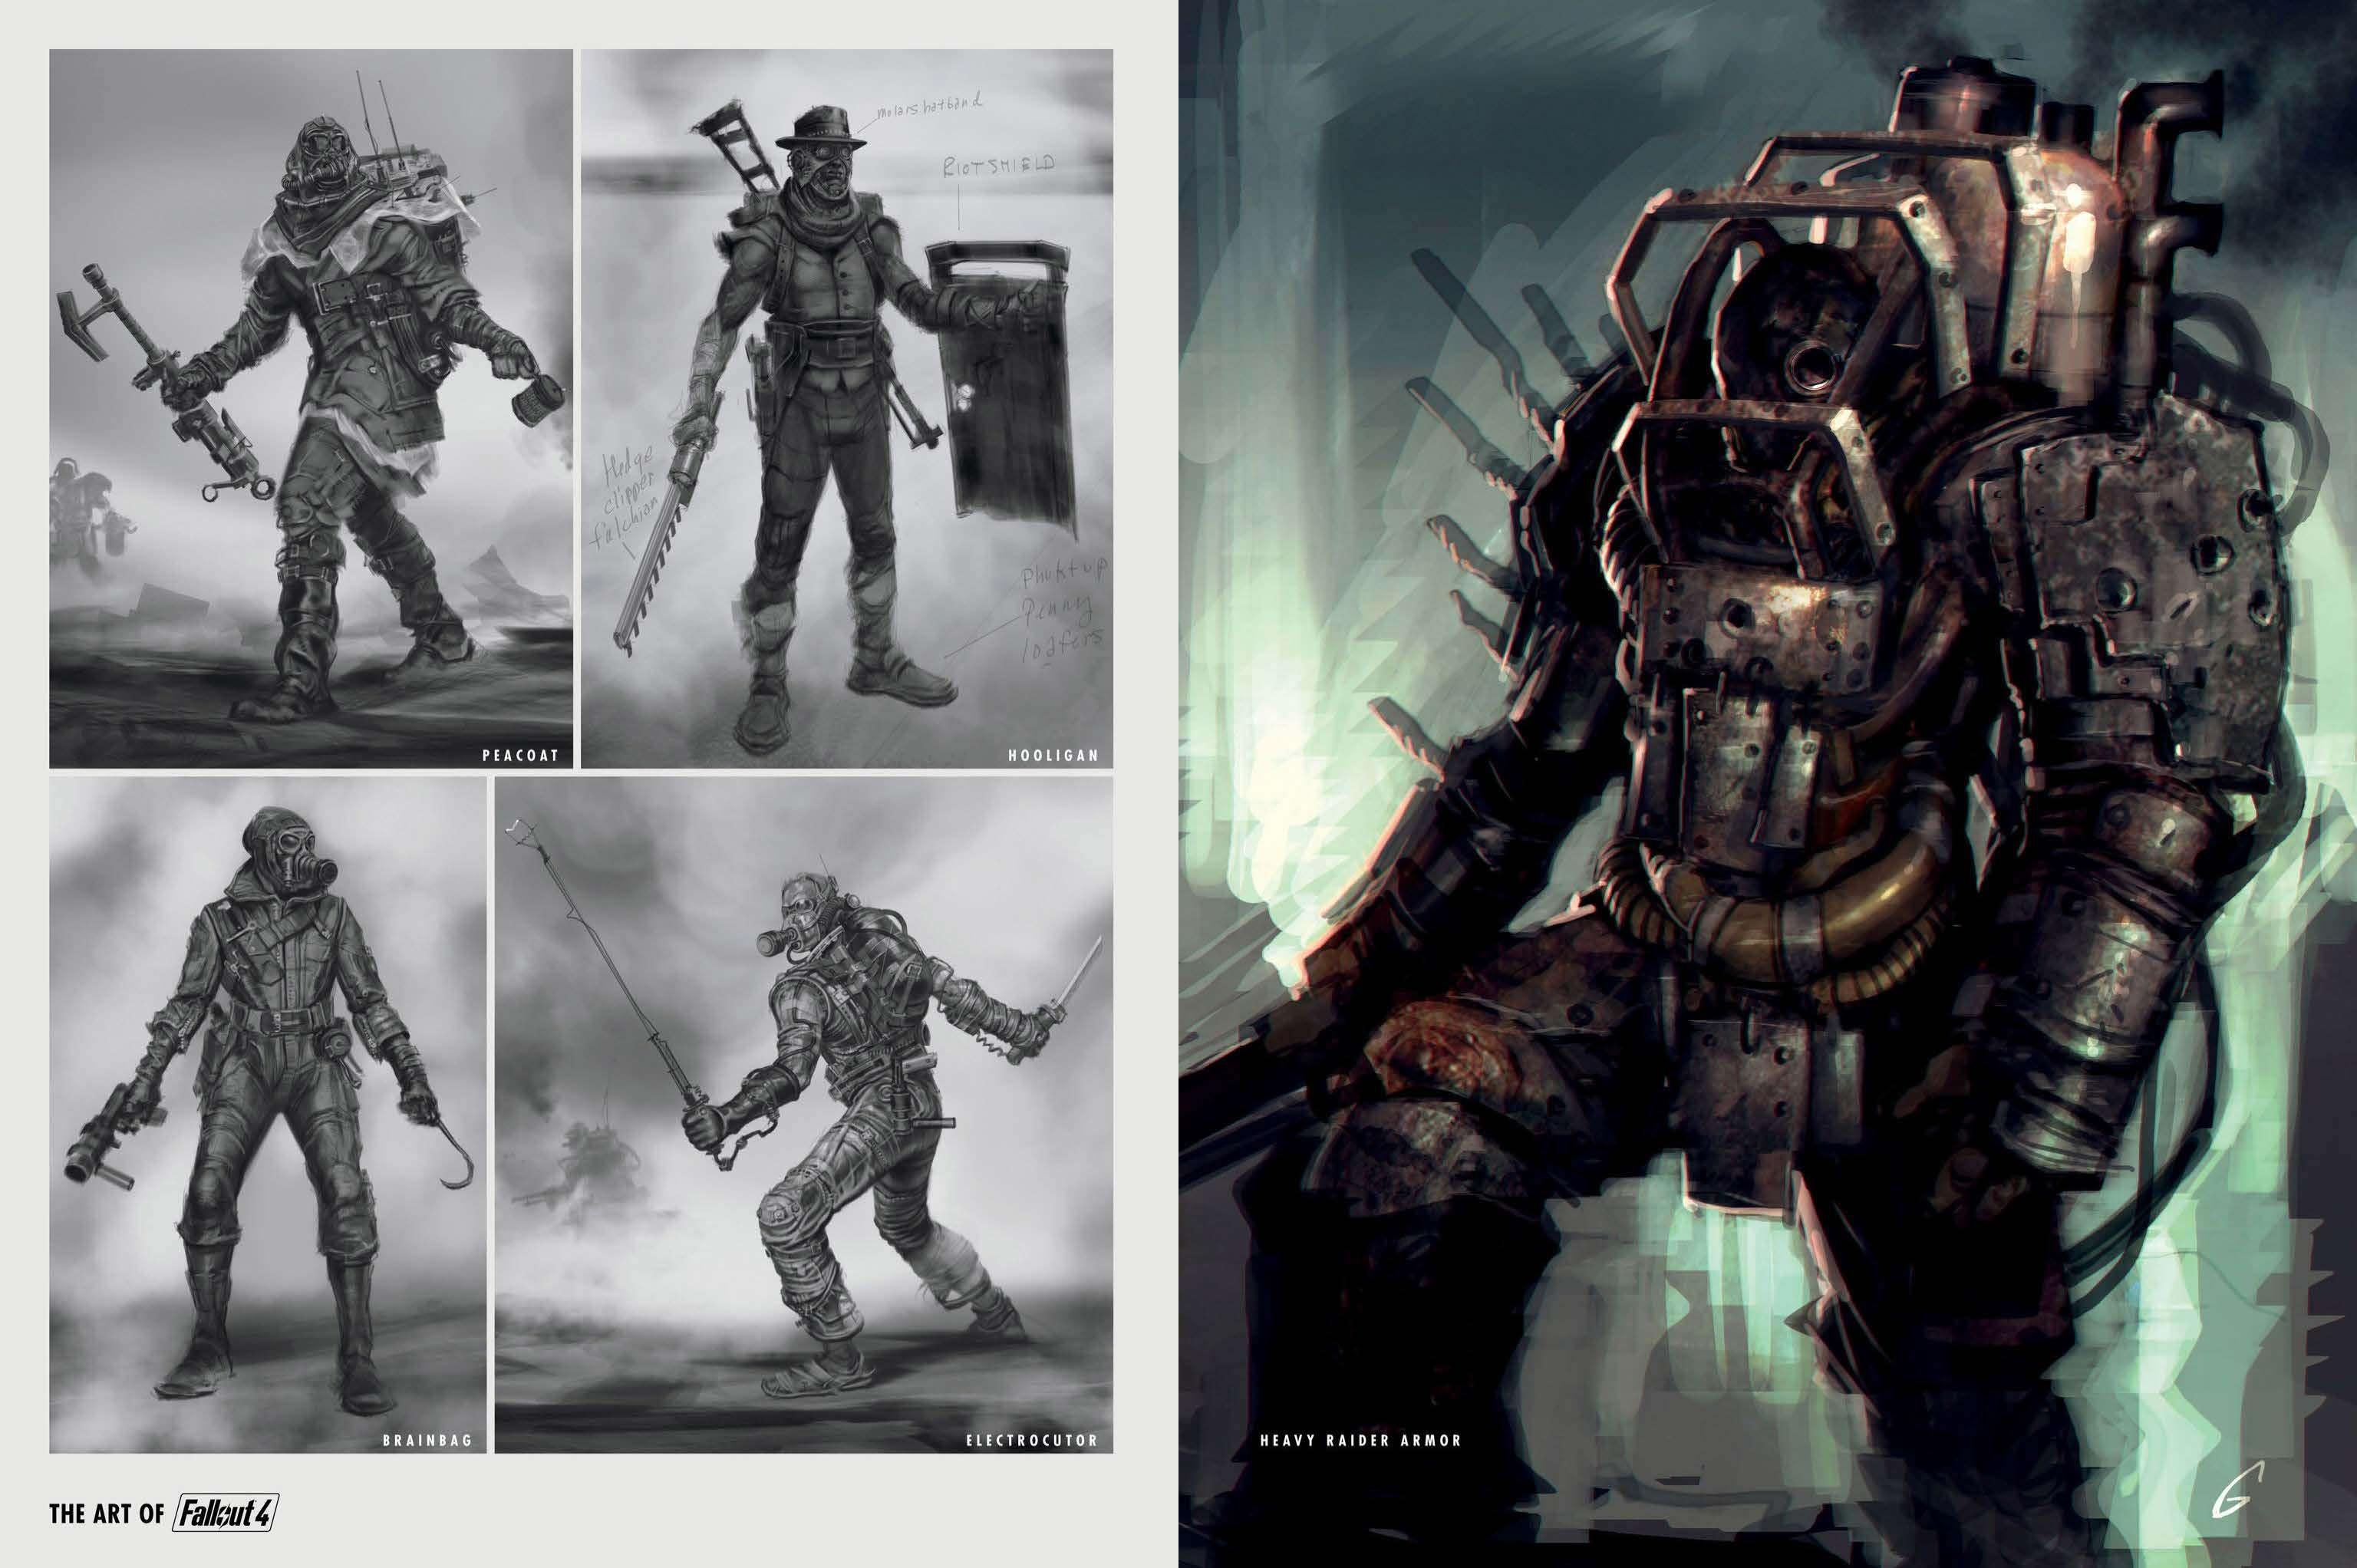 The Art of Fallout 4 - # 092 - Fallout 4 арт